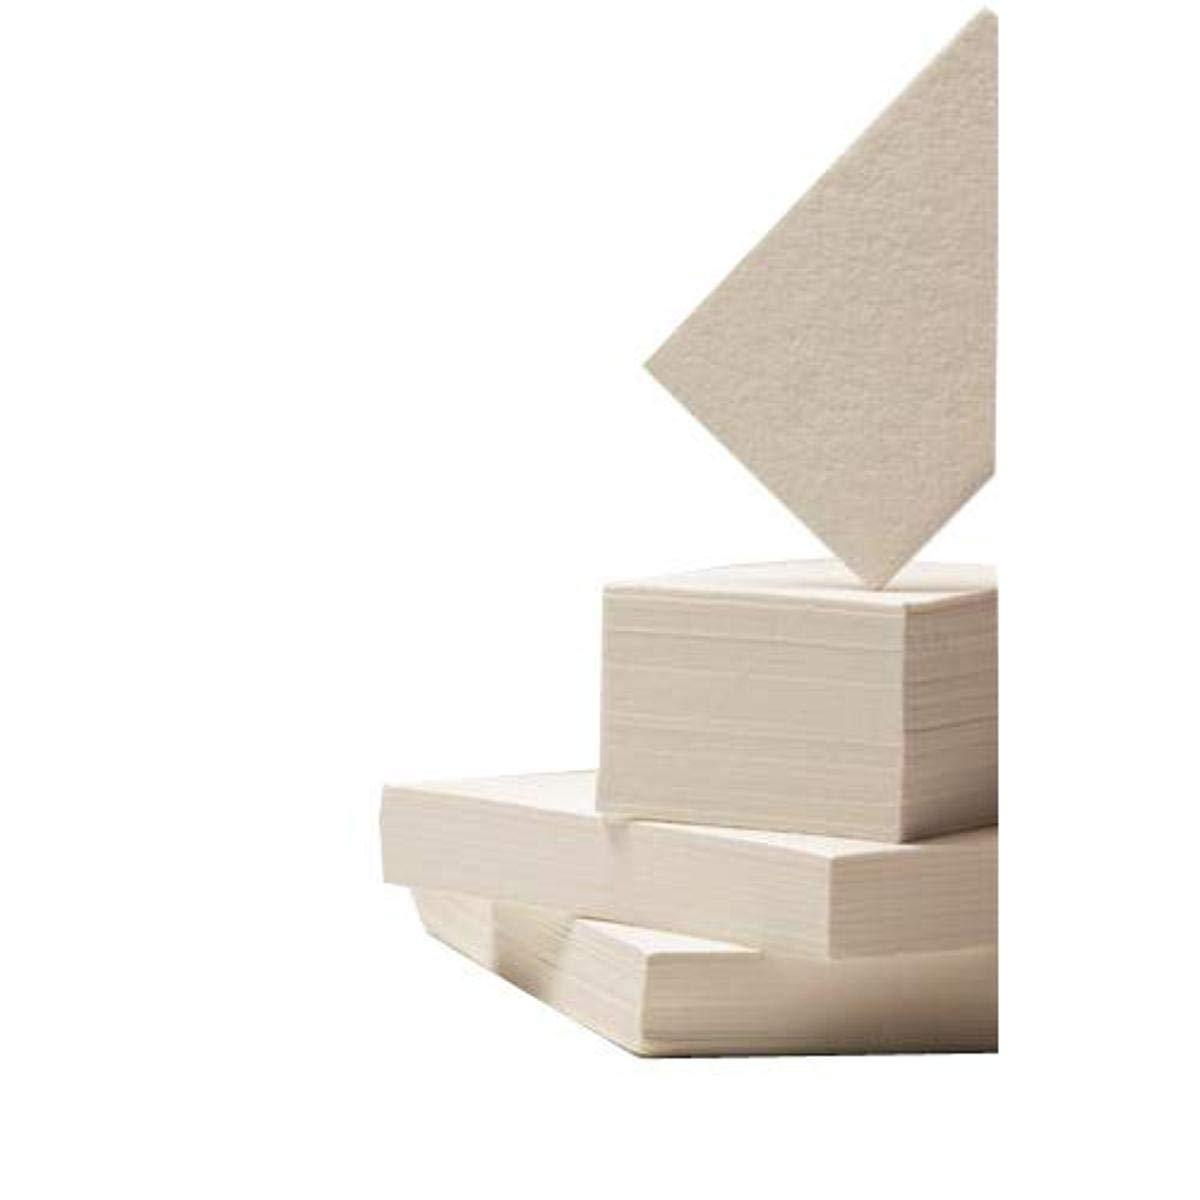 Ahlstrom-Munksjö 2388-1416 Luxury Blotting Paper L 16cm Award Width 14cm